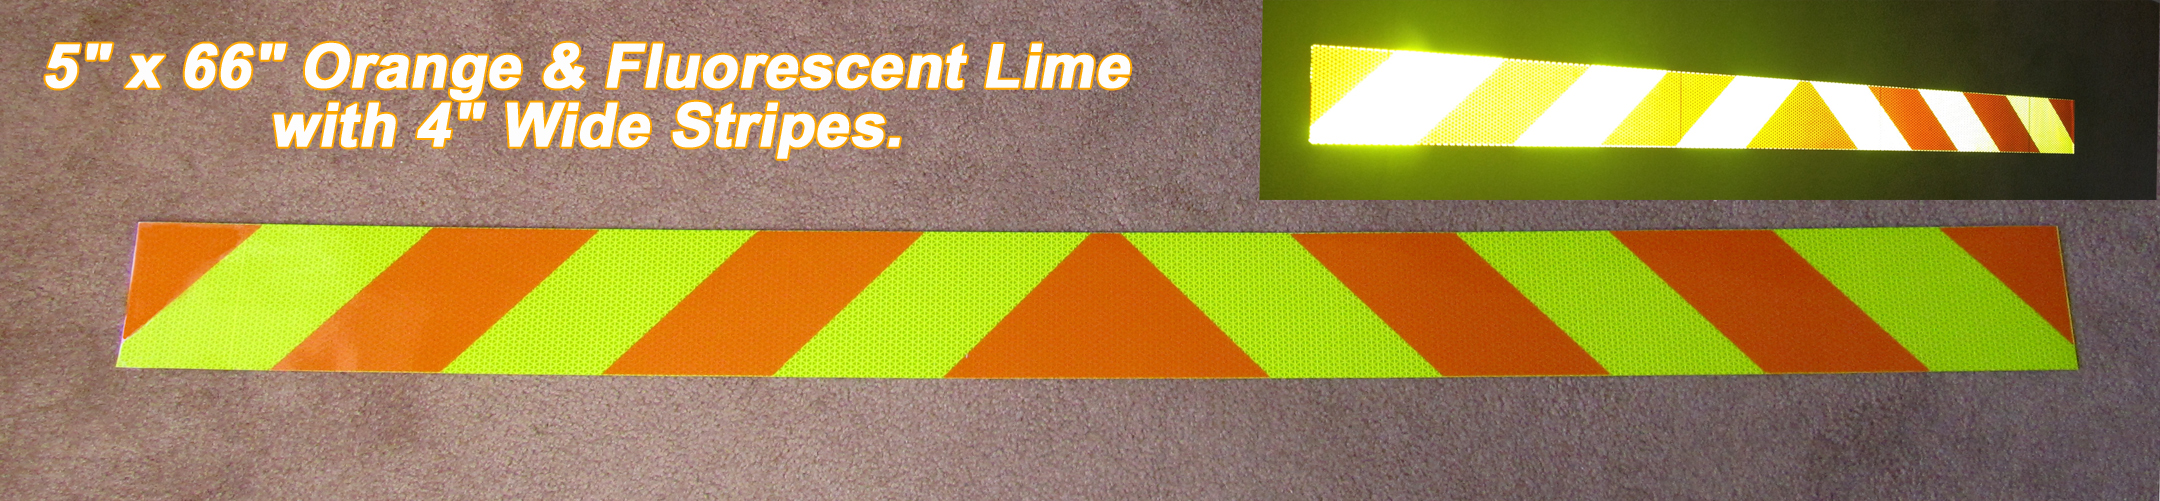 "5"" x 66"" orange lime reflective panel"